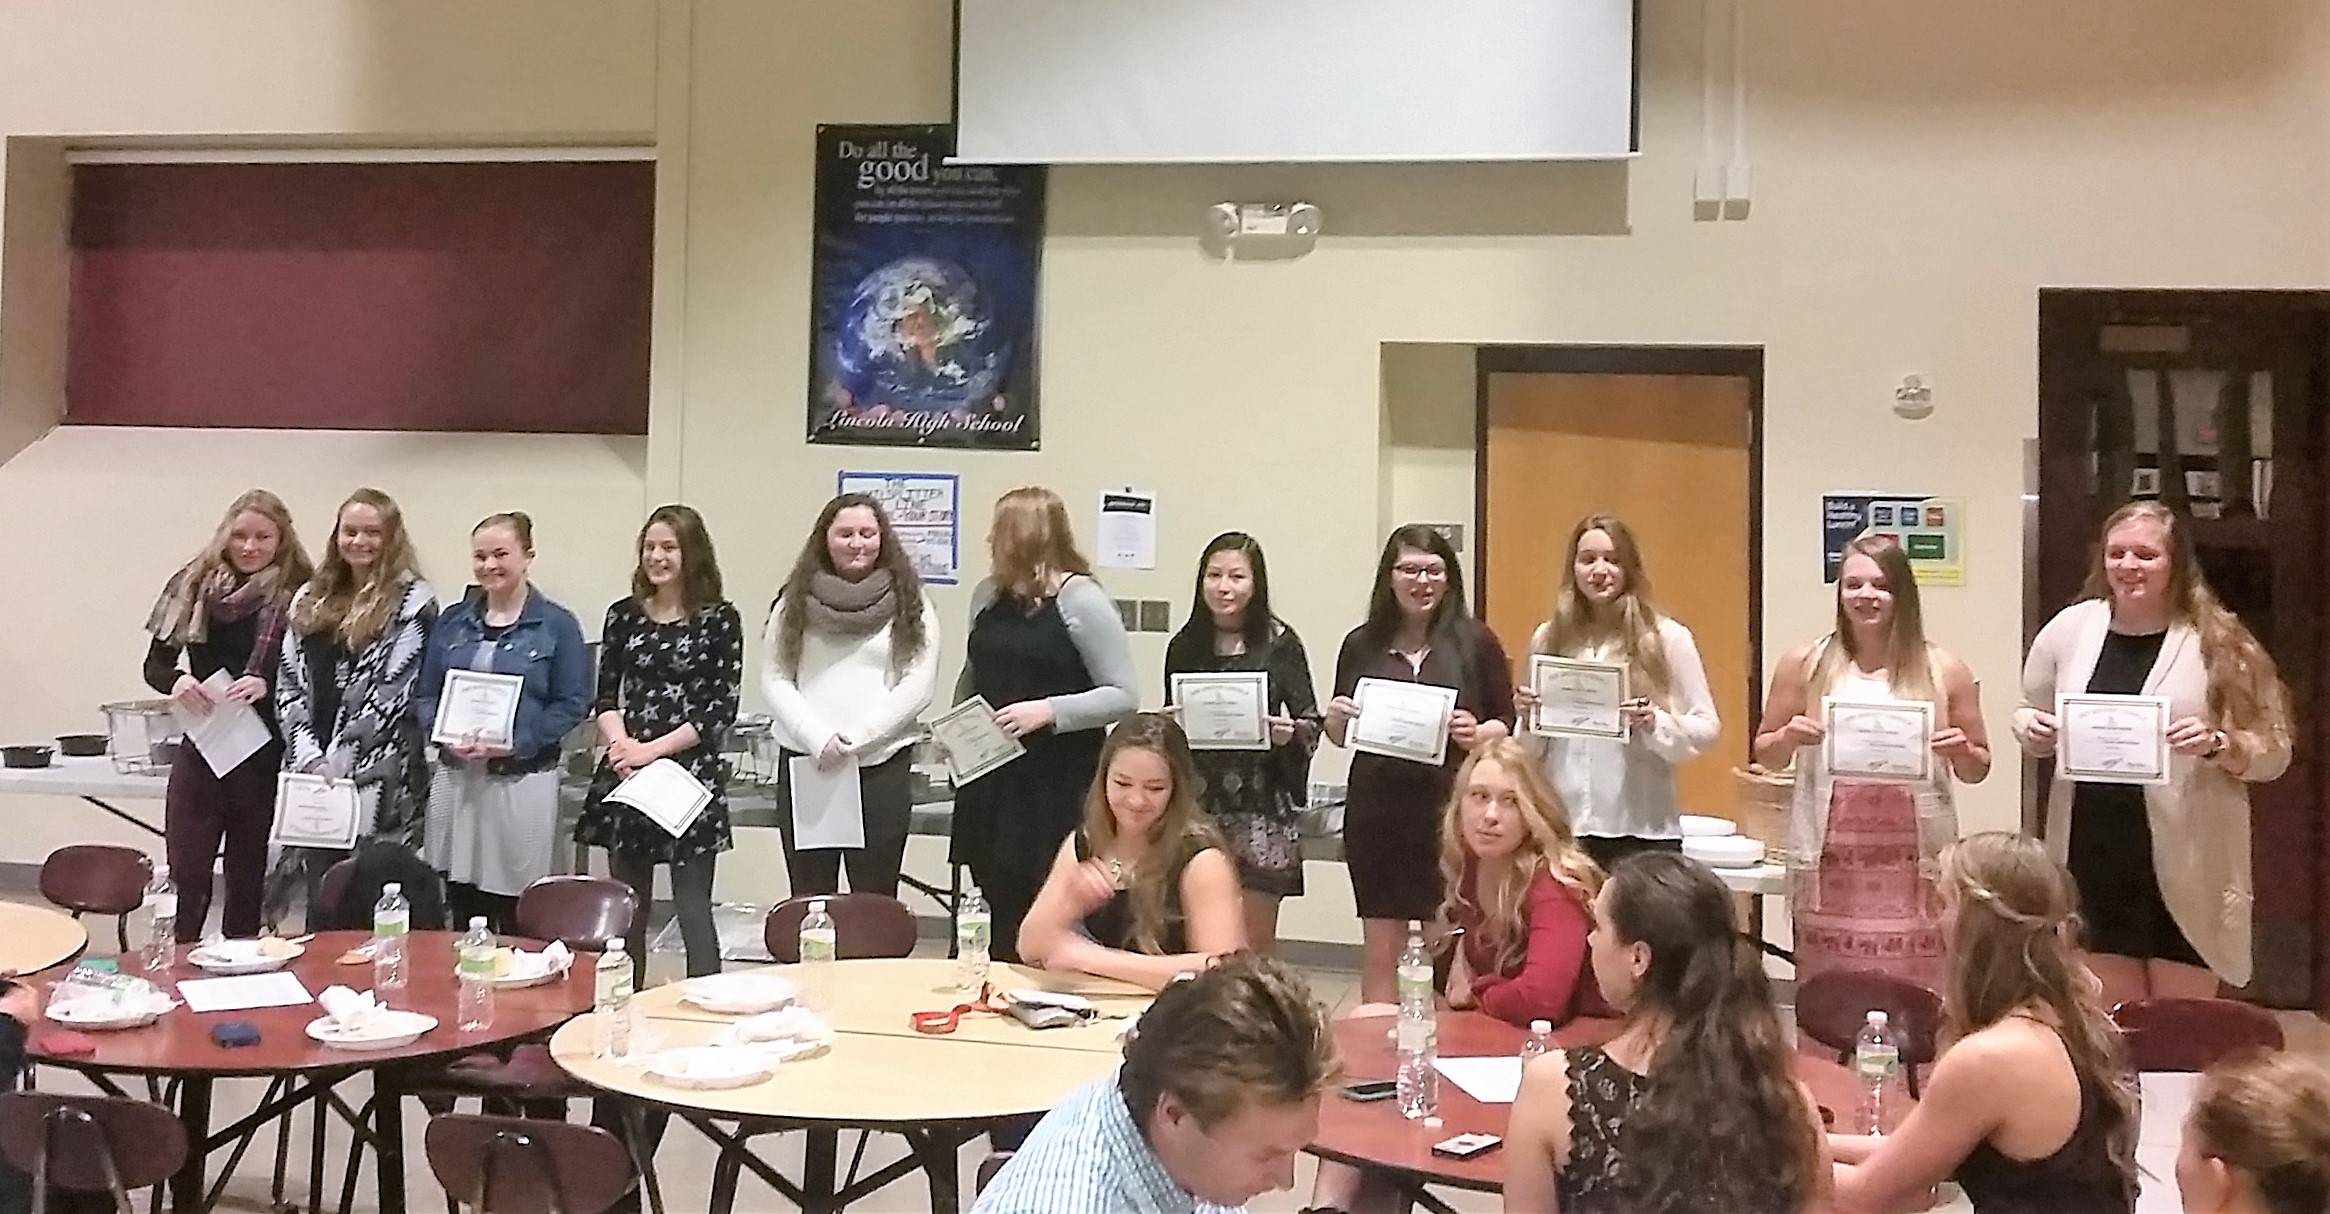 2016-nov8-team-banquet-jv-letter-winners